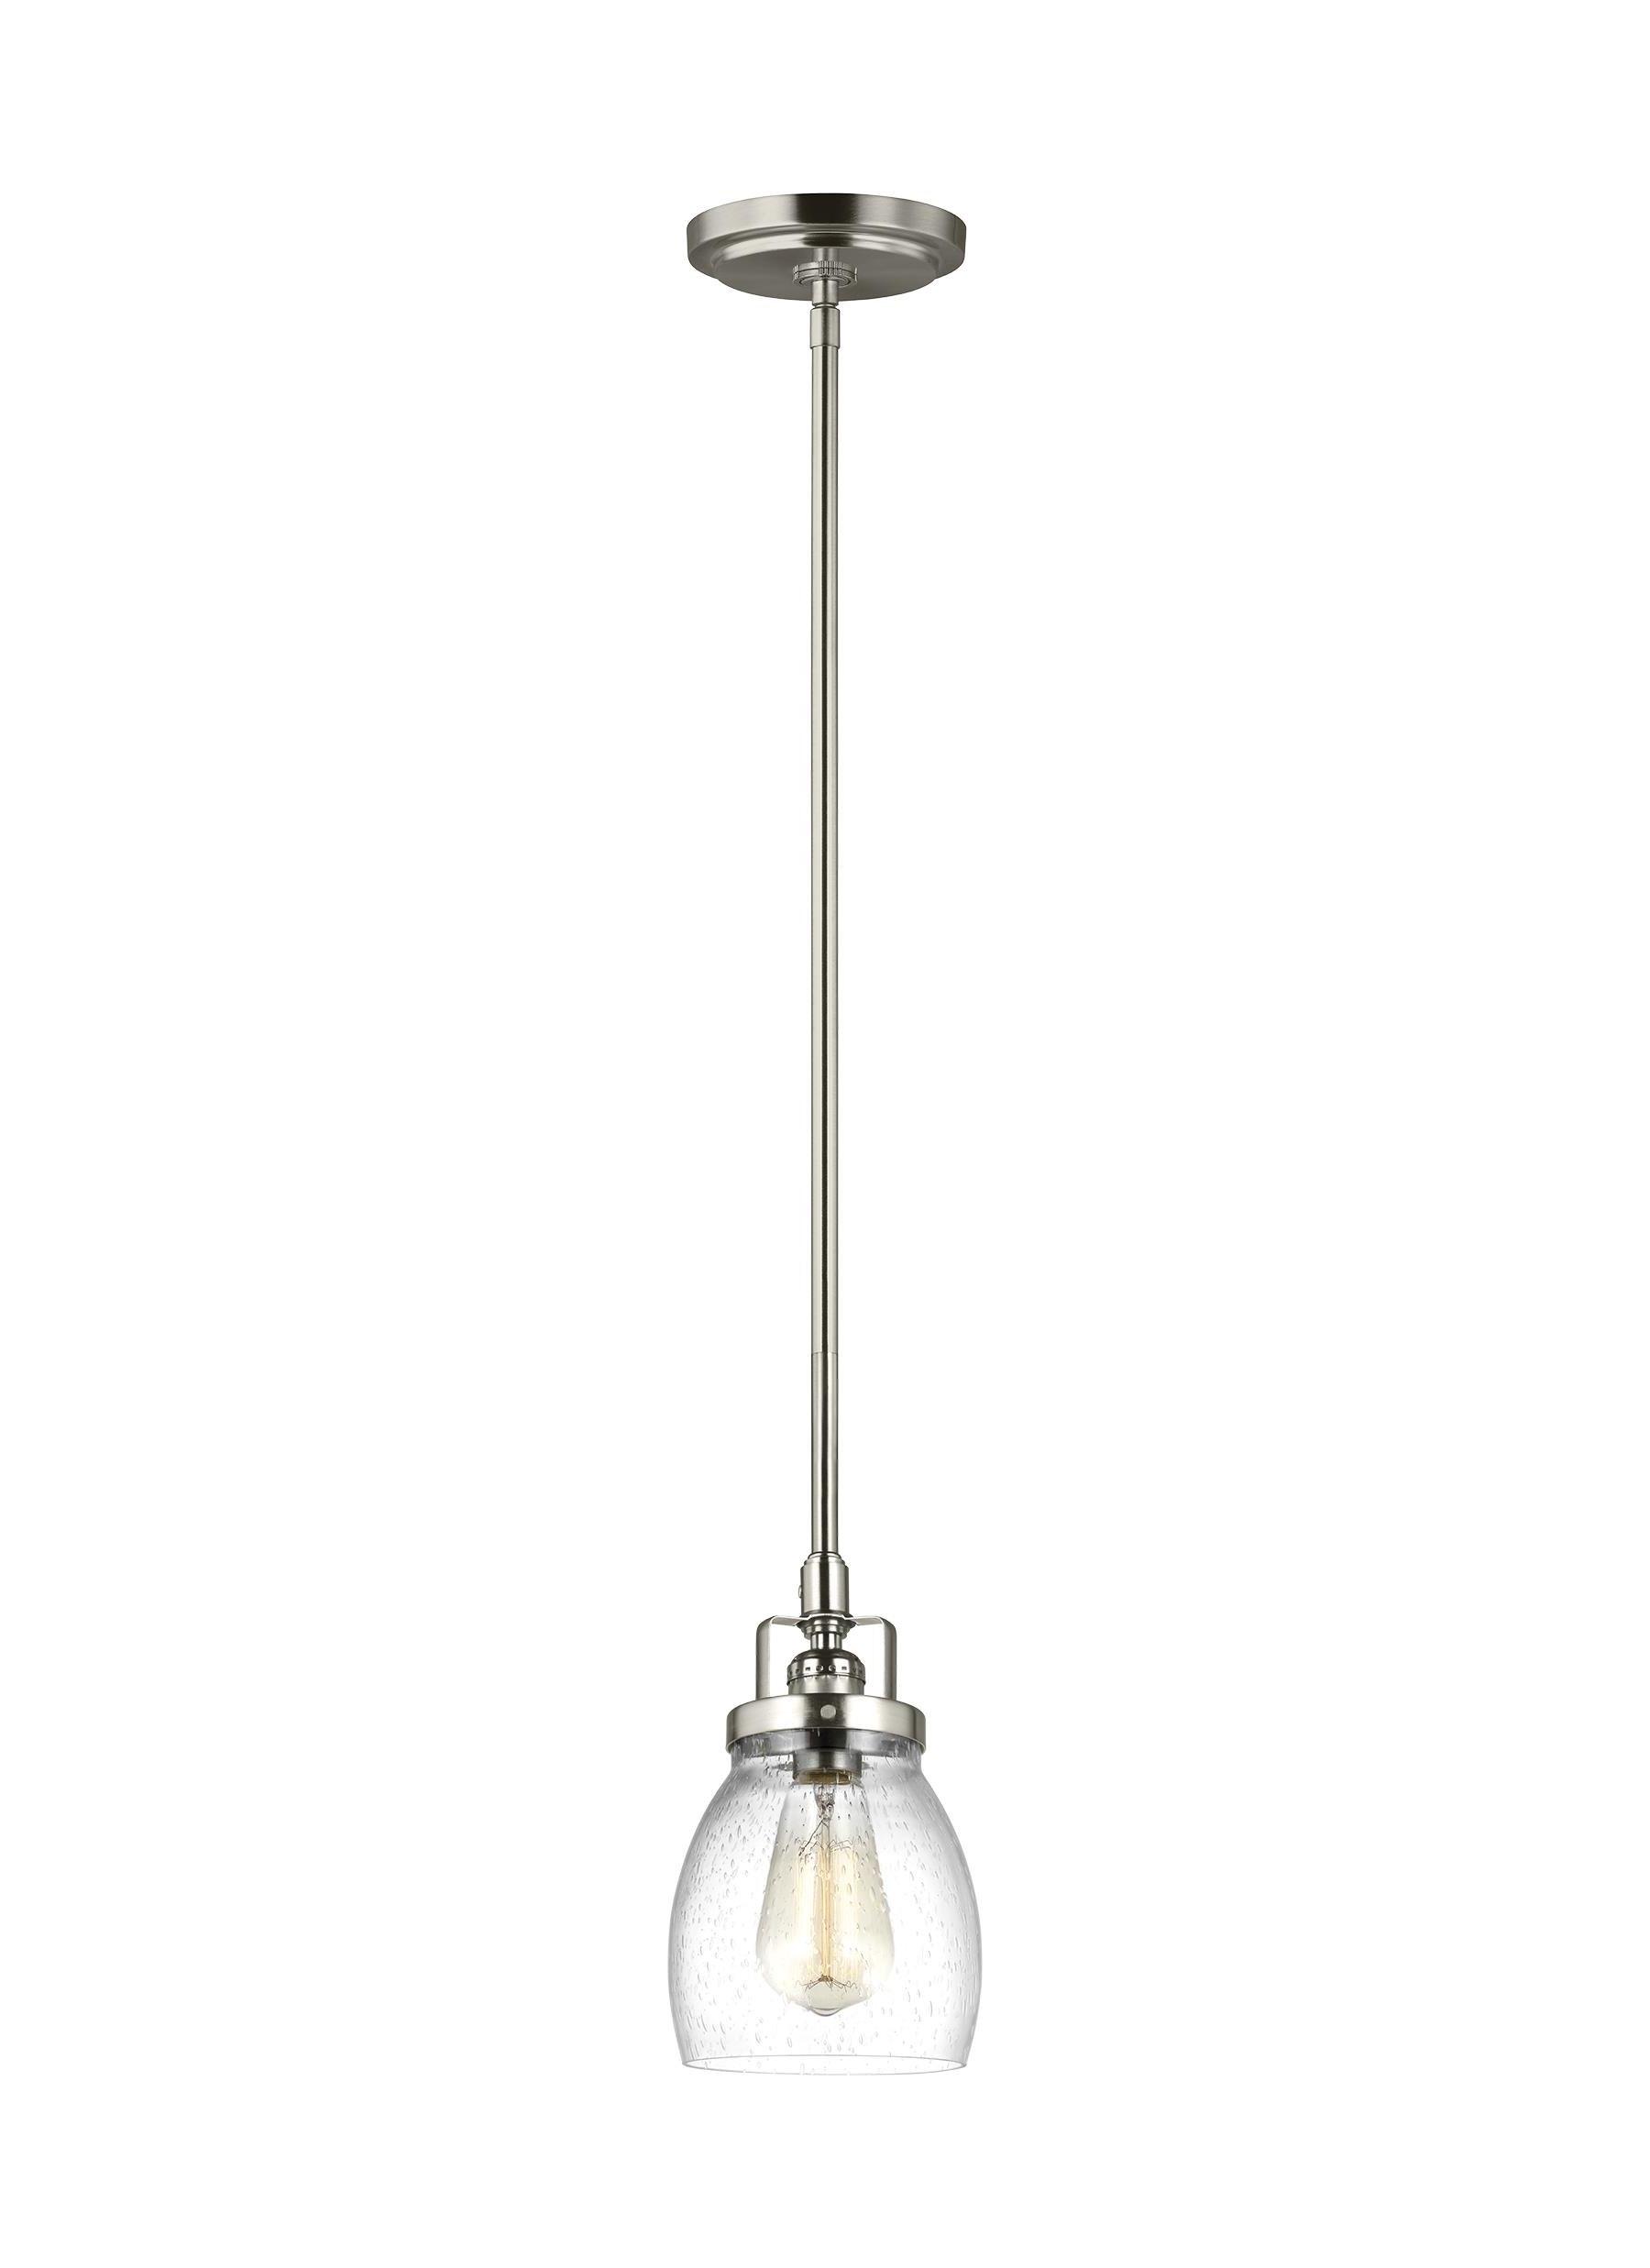 Houon 1 Light Cone Bell Pendant Pertaining To 2020 Bundaberg 1 Light Single Bell Pendants (View 10 of 20)